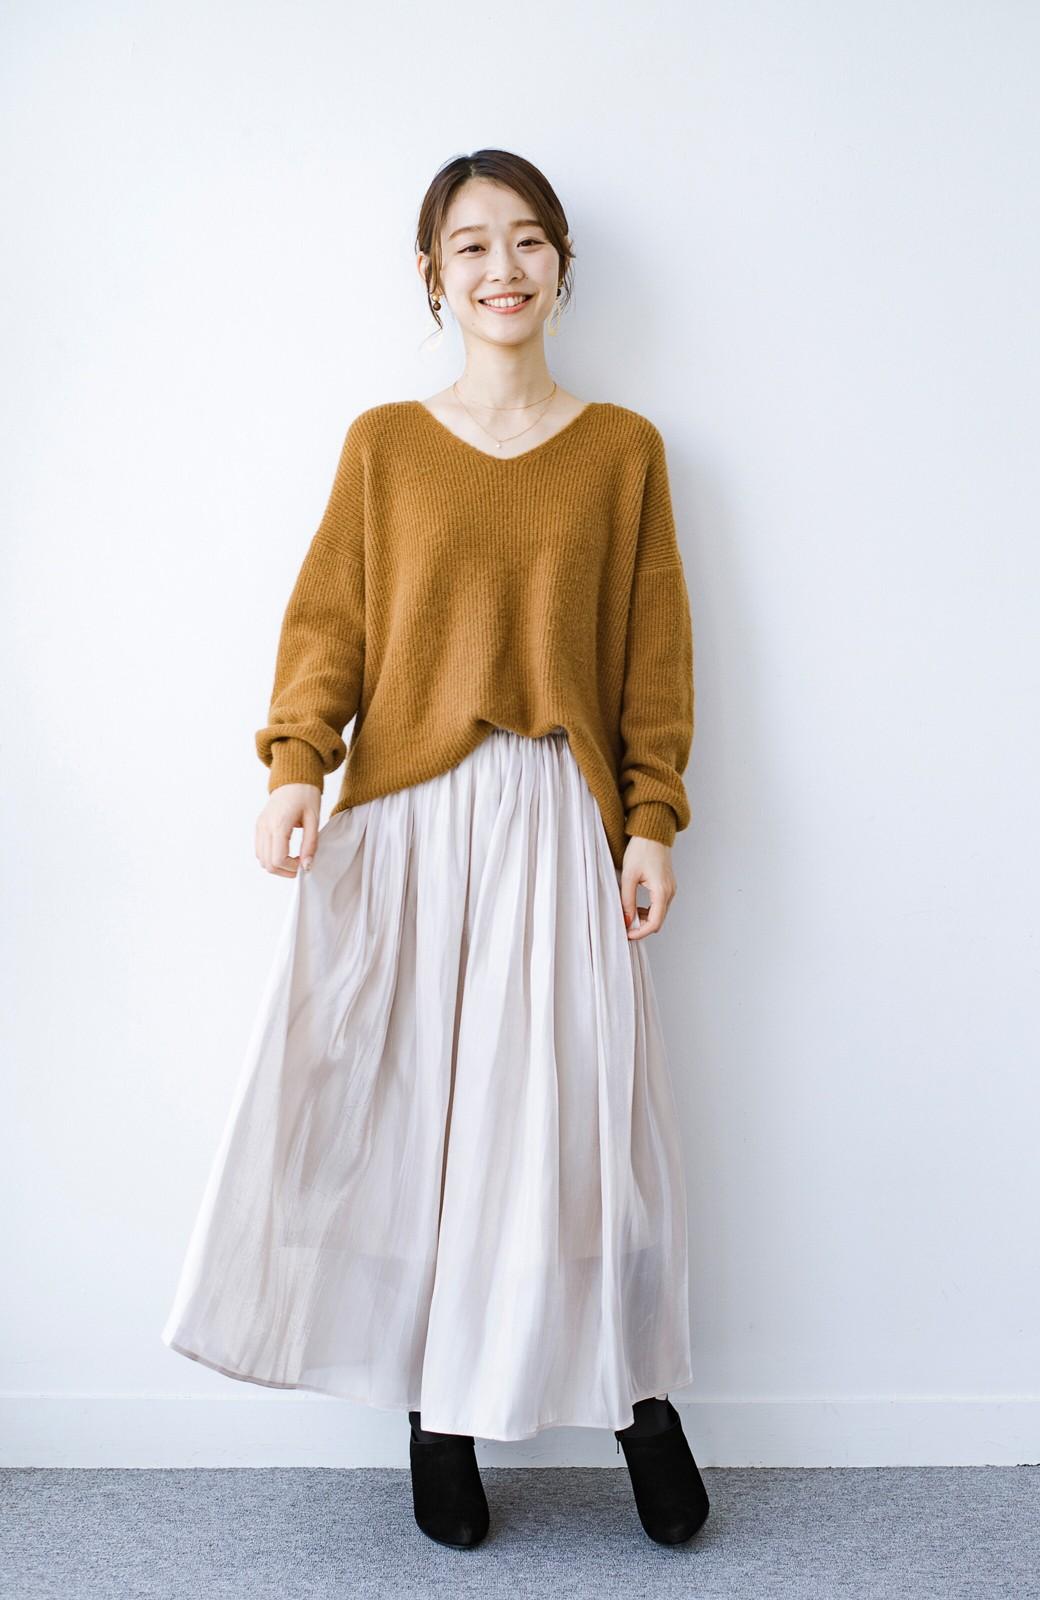 haco! 【人気のため新色追加!】1枚でも重ね着にも便利なキラキラ素材がかわいいロングスカート by laulea <アイボリー>の商品写真12